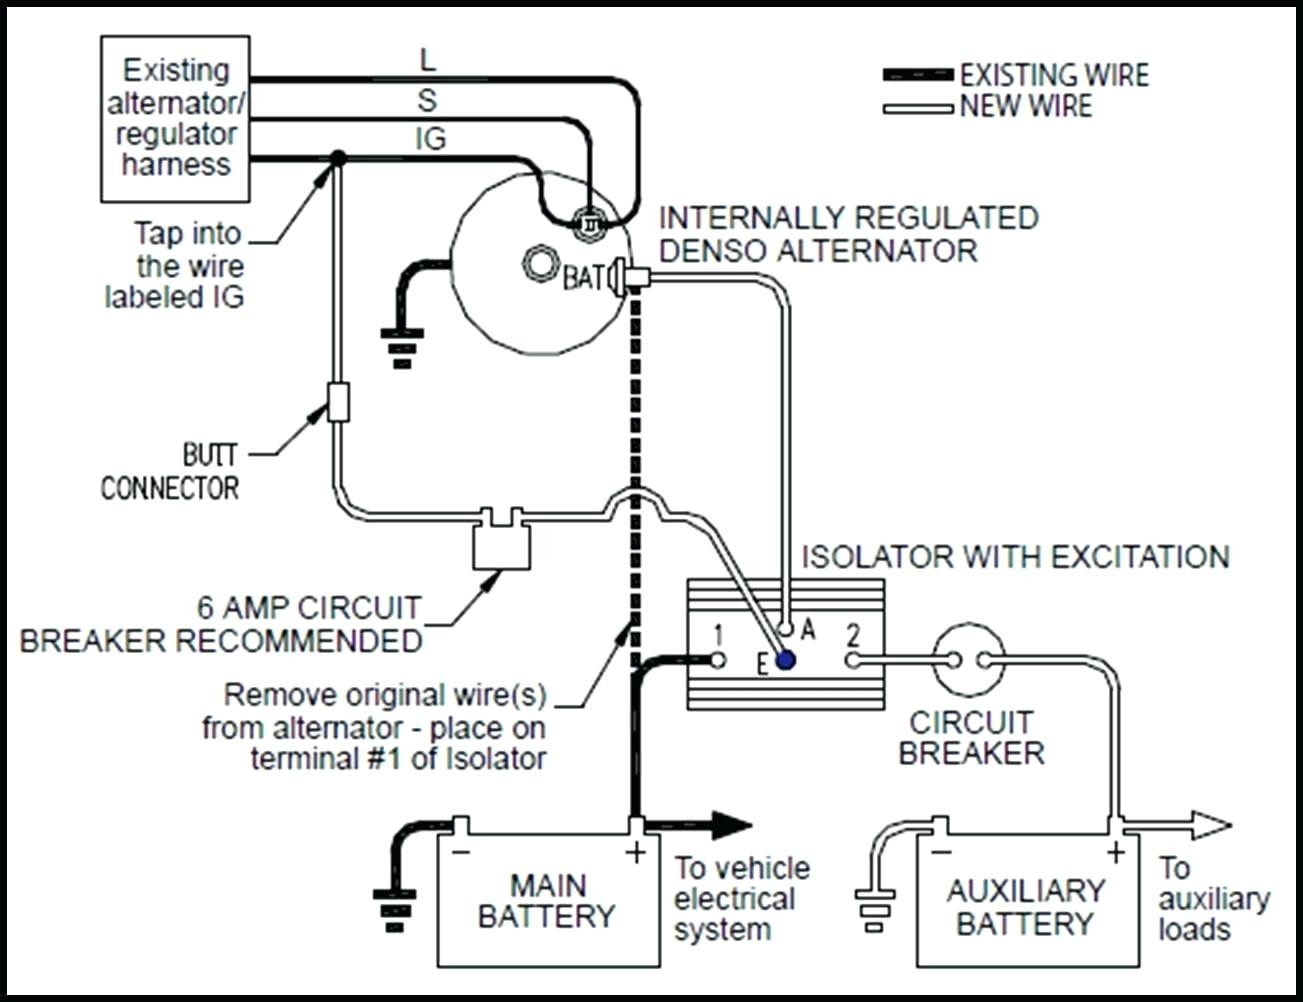 Sure Power Battery Isolator Wiring Diagram | Wiring Diagram - Sure Power Battery Isolator Wiring Diagram